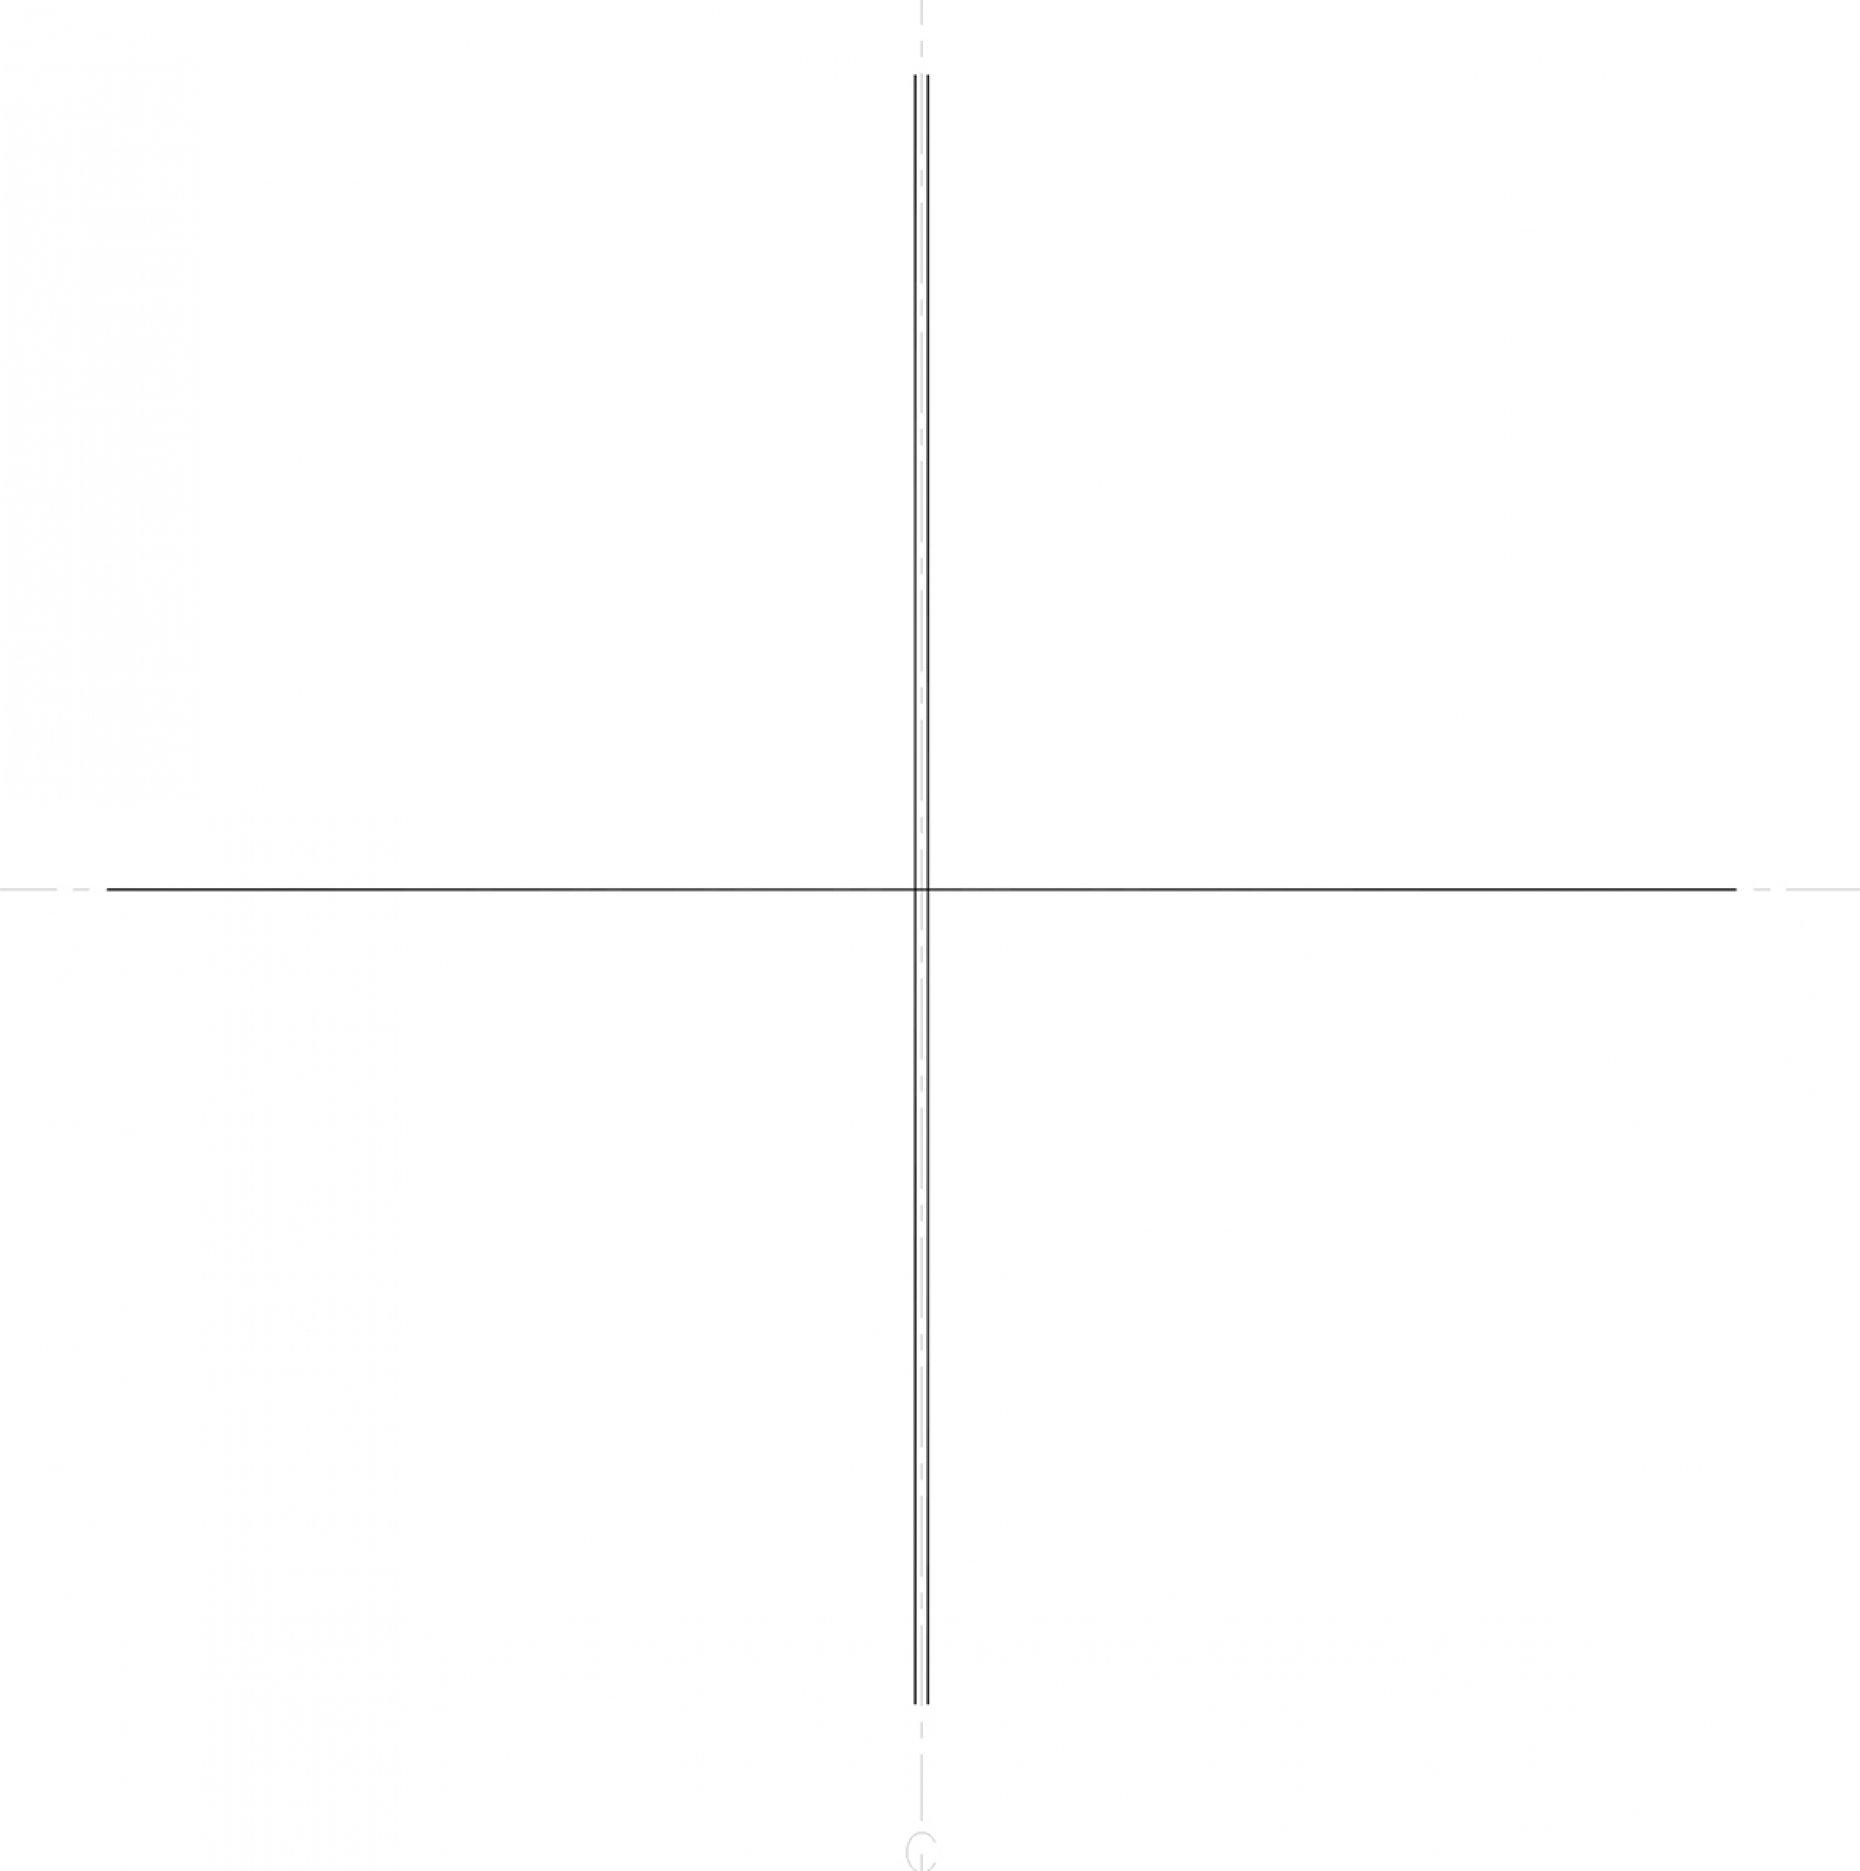 NE53 Vertical Gauge Lines 0.1mm apart + Horizontal Line Pattern